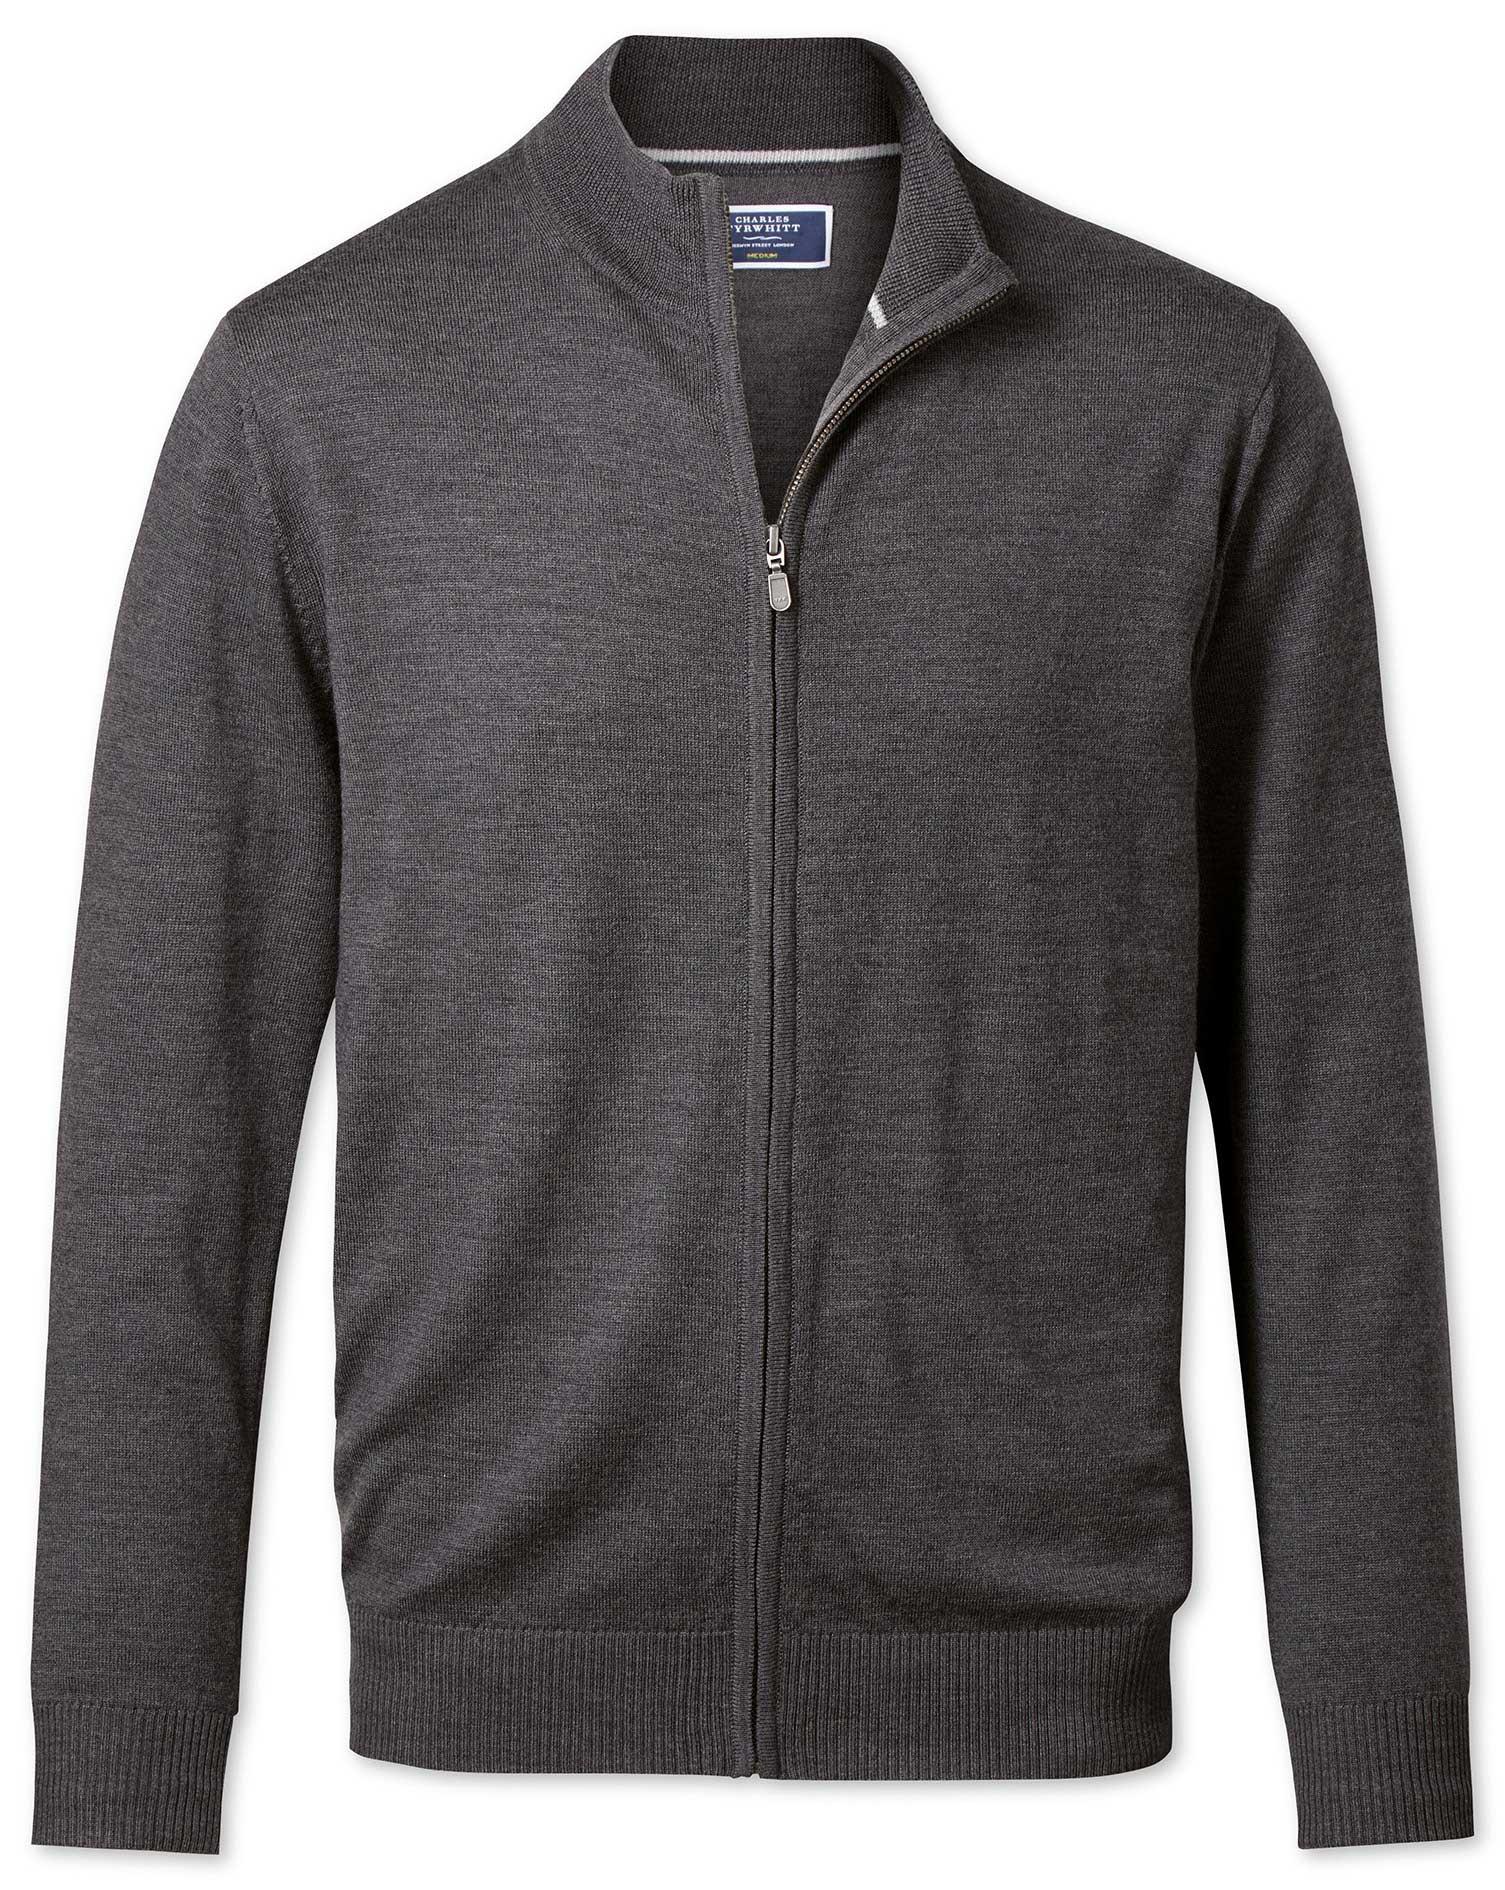 Charcoal Merino Wool Zip Through Cardigan Size XXL by Charles Tyrwhitt